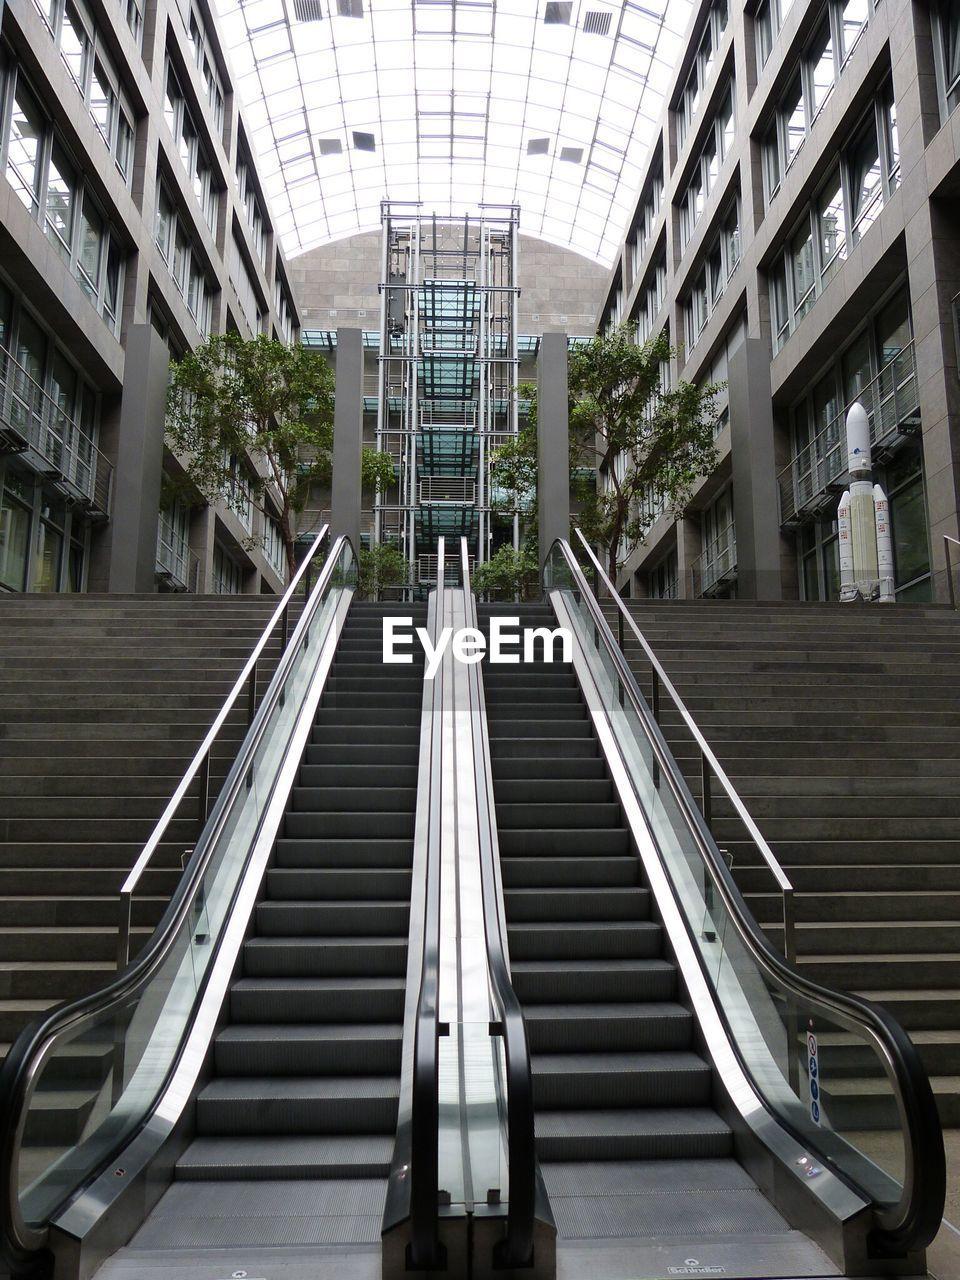 Empty Escalators In Hotel